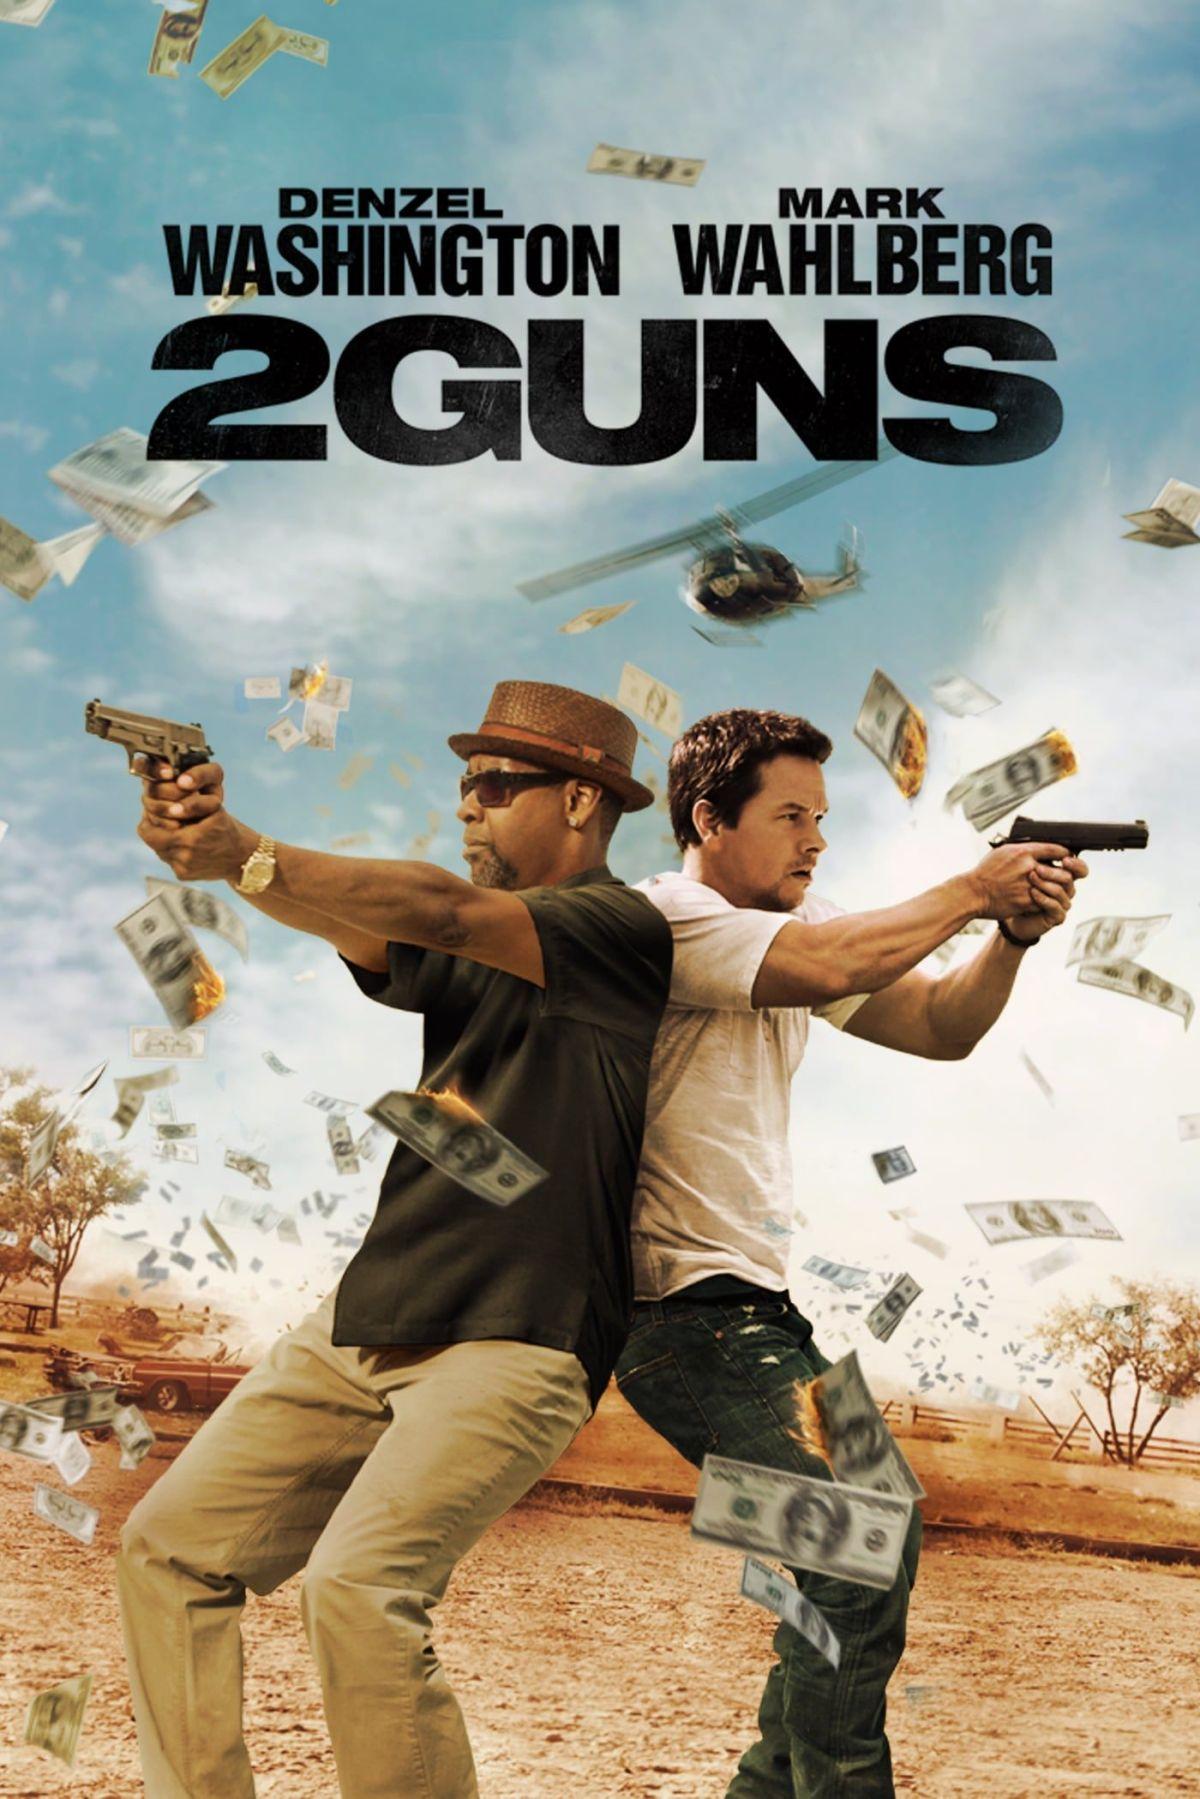 2 guns film poster